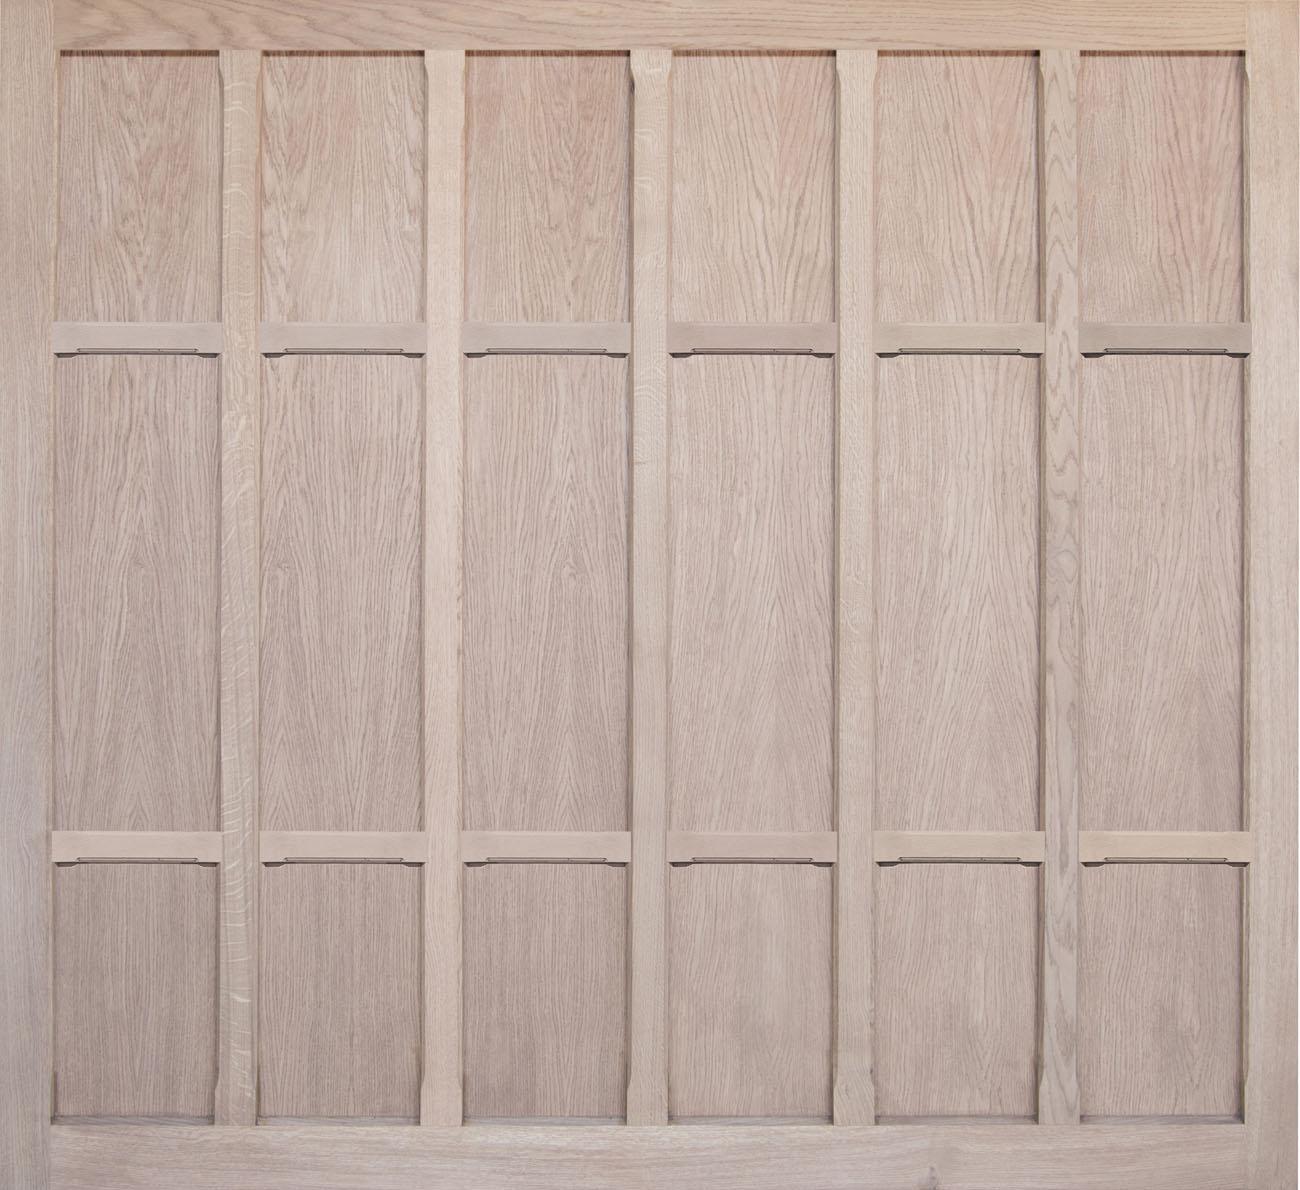 Fairoak panel-built